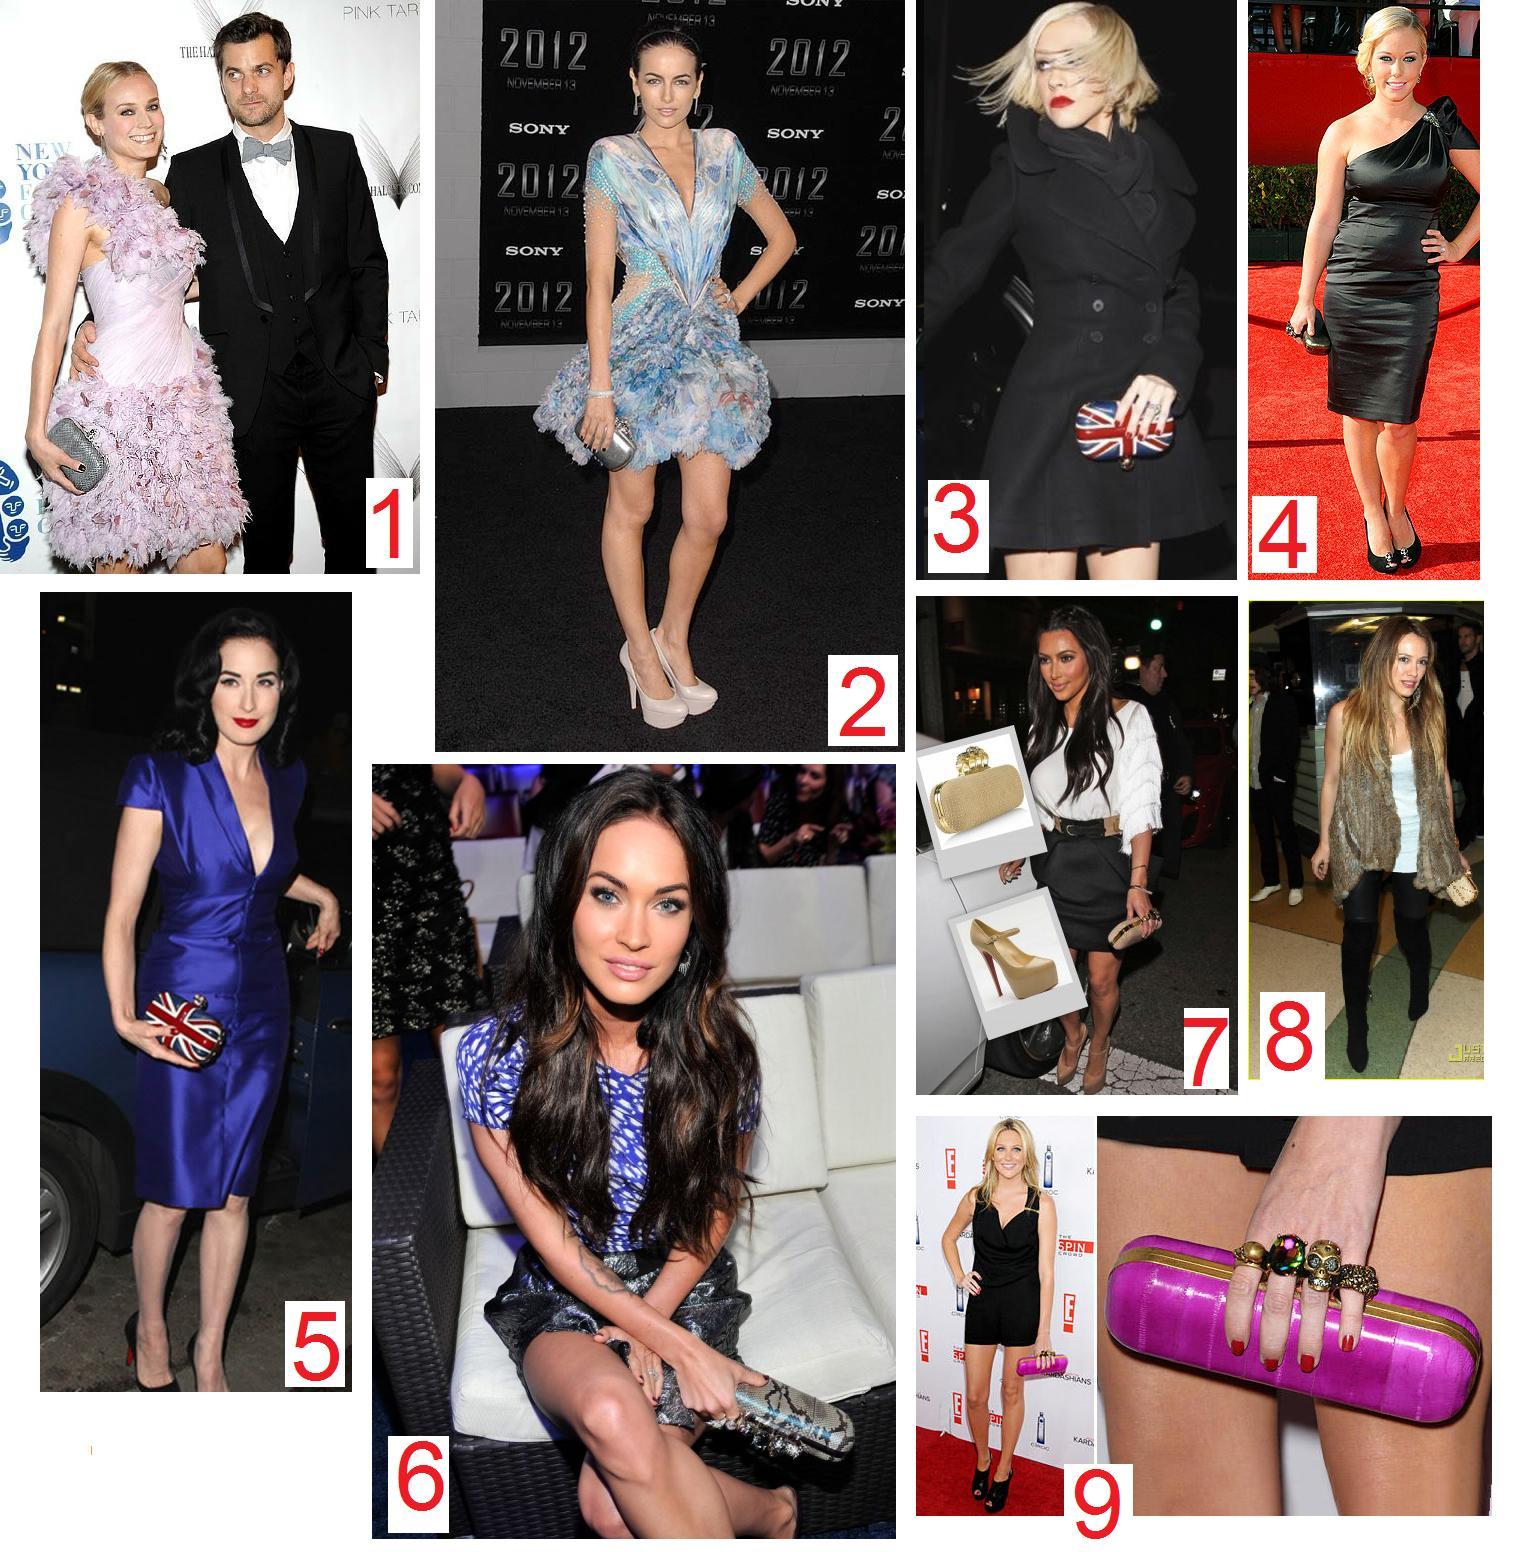 http://1.bp.blogspot.com/-YCoJkruOKqs/Teph6P5ppVI/AAAAAAAAACU/eZnUQ5w-RrM/s1600/celebridades+clutches.jpg